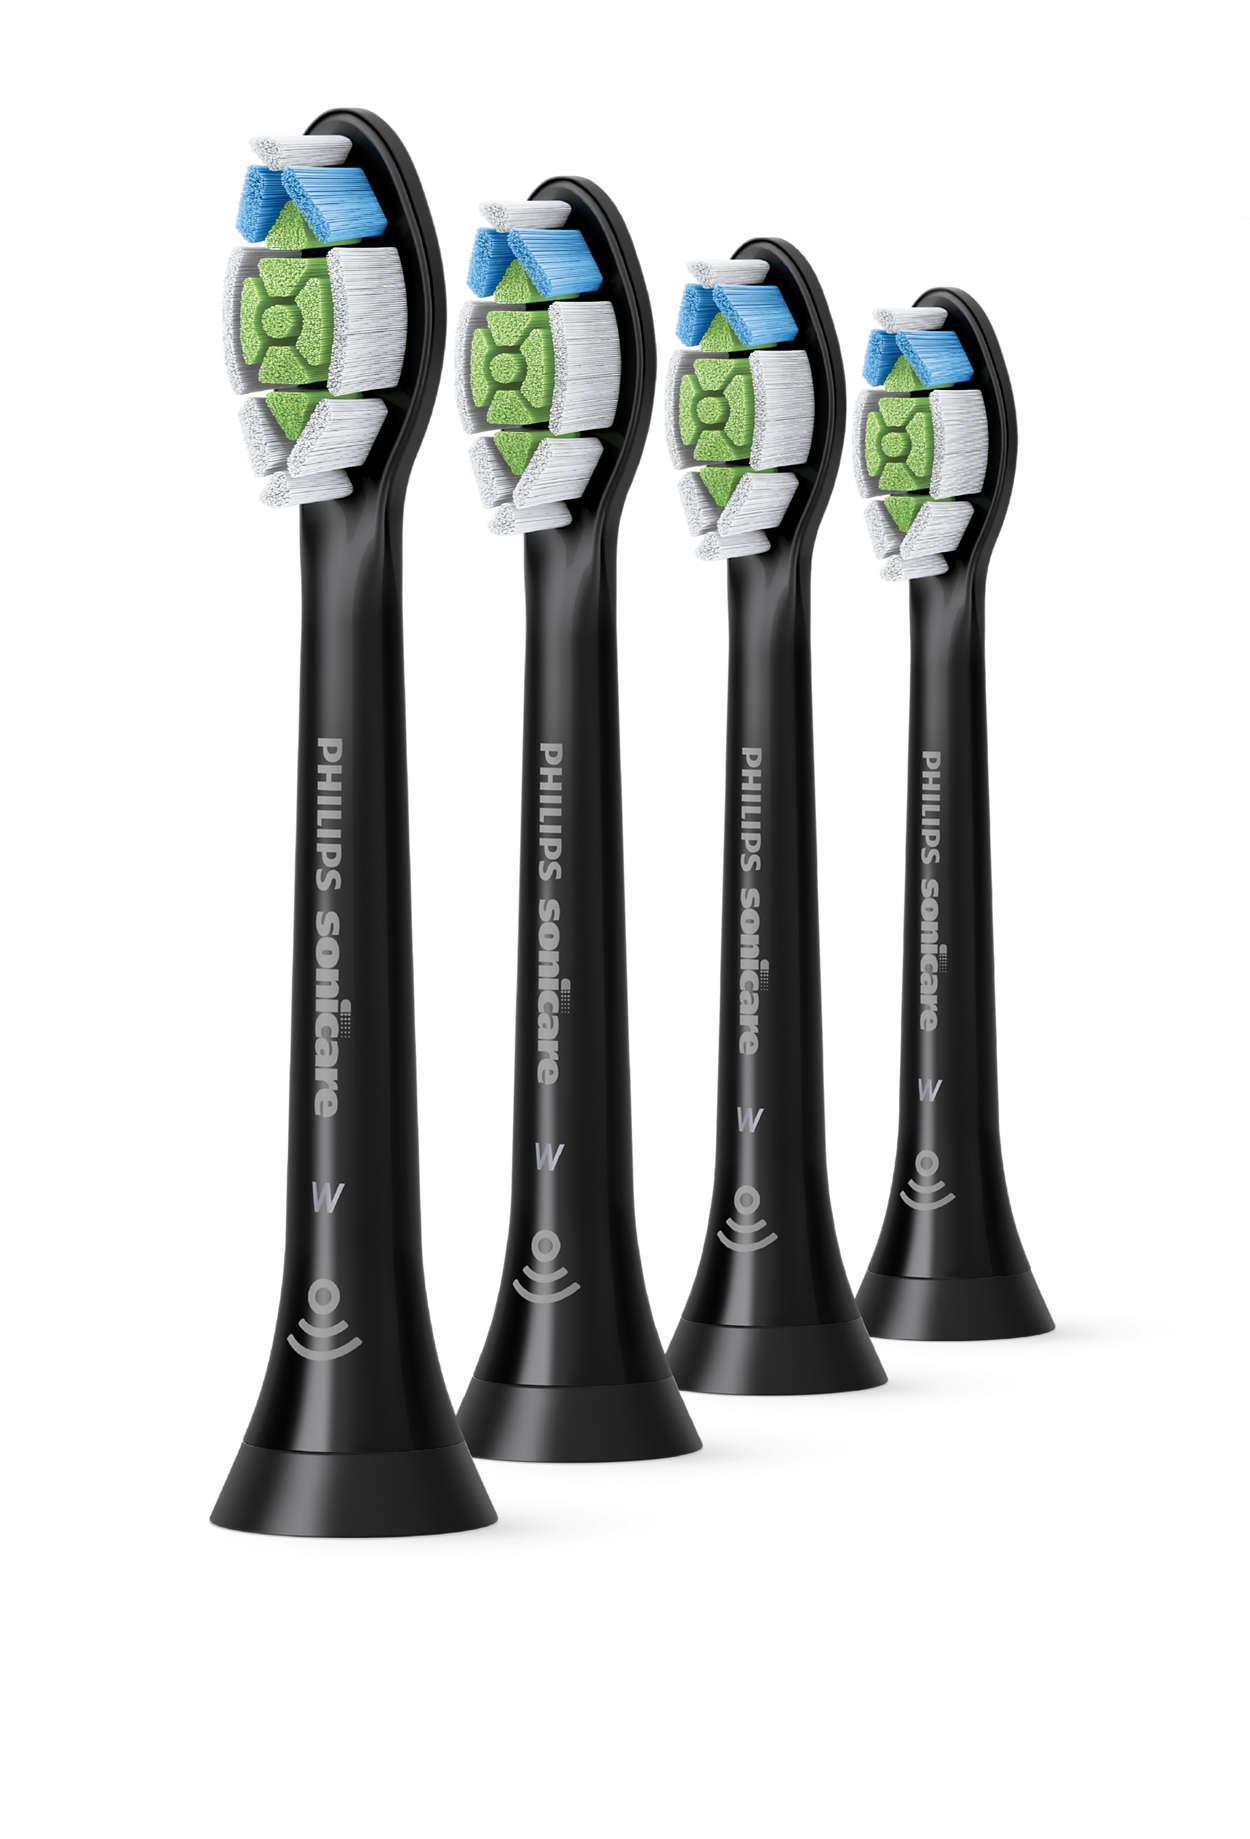 Philips Sonicare W2 Optimal White  standarta zobu birstes galviņas (4 gab) HX6064/11 mutes higiēnai